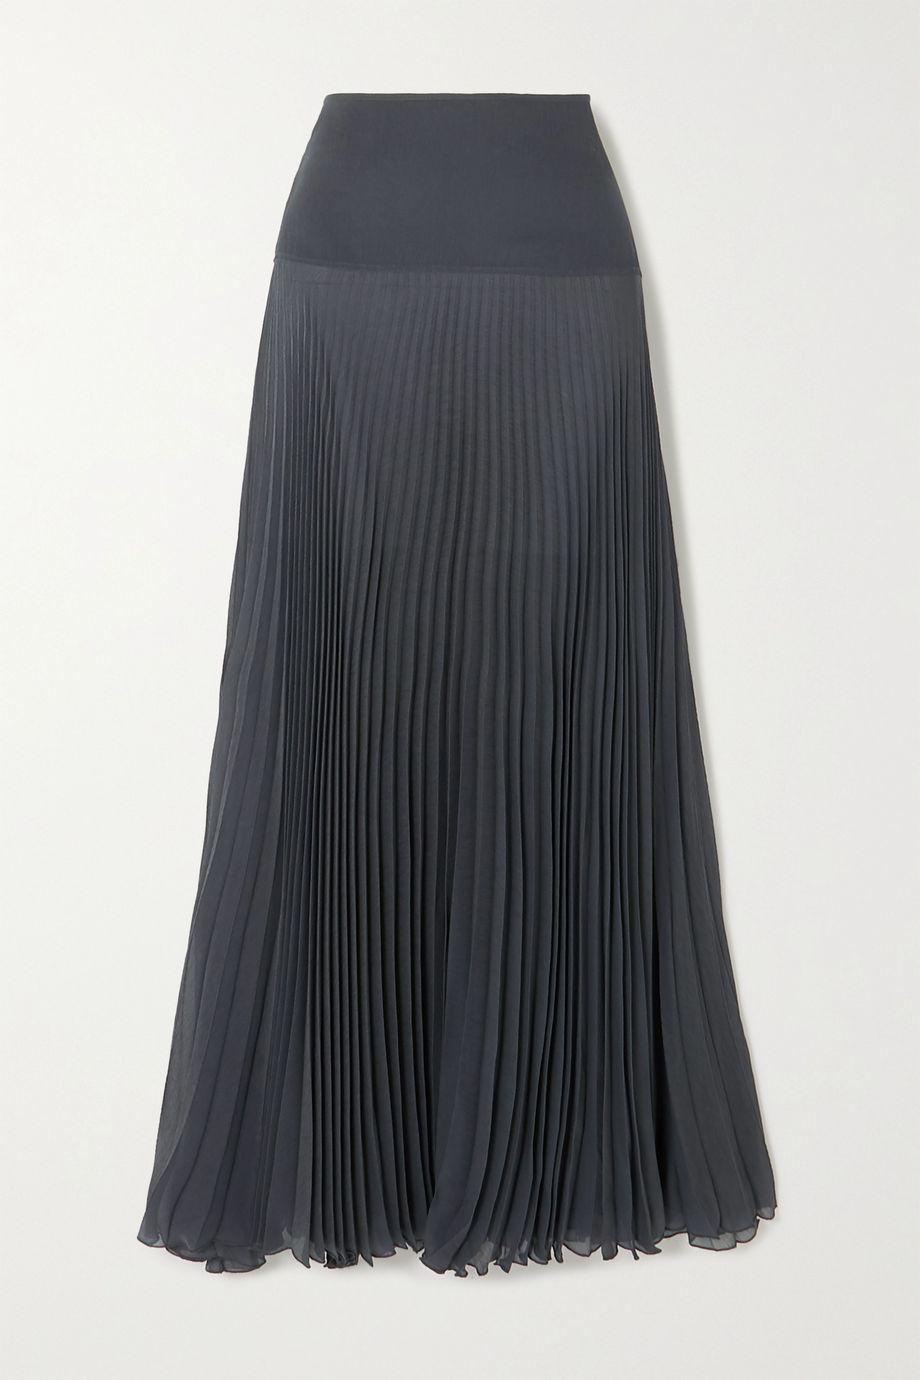 Chloé Maxirock aus plissiertem Krepon